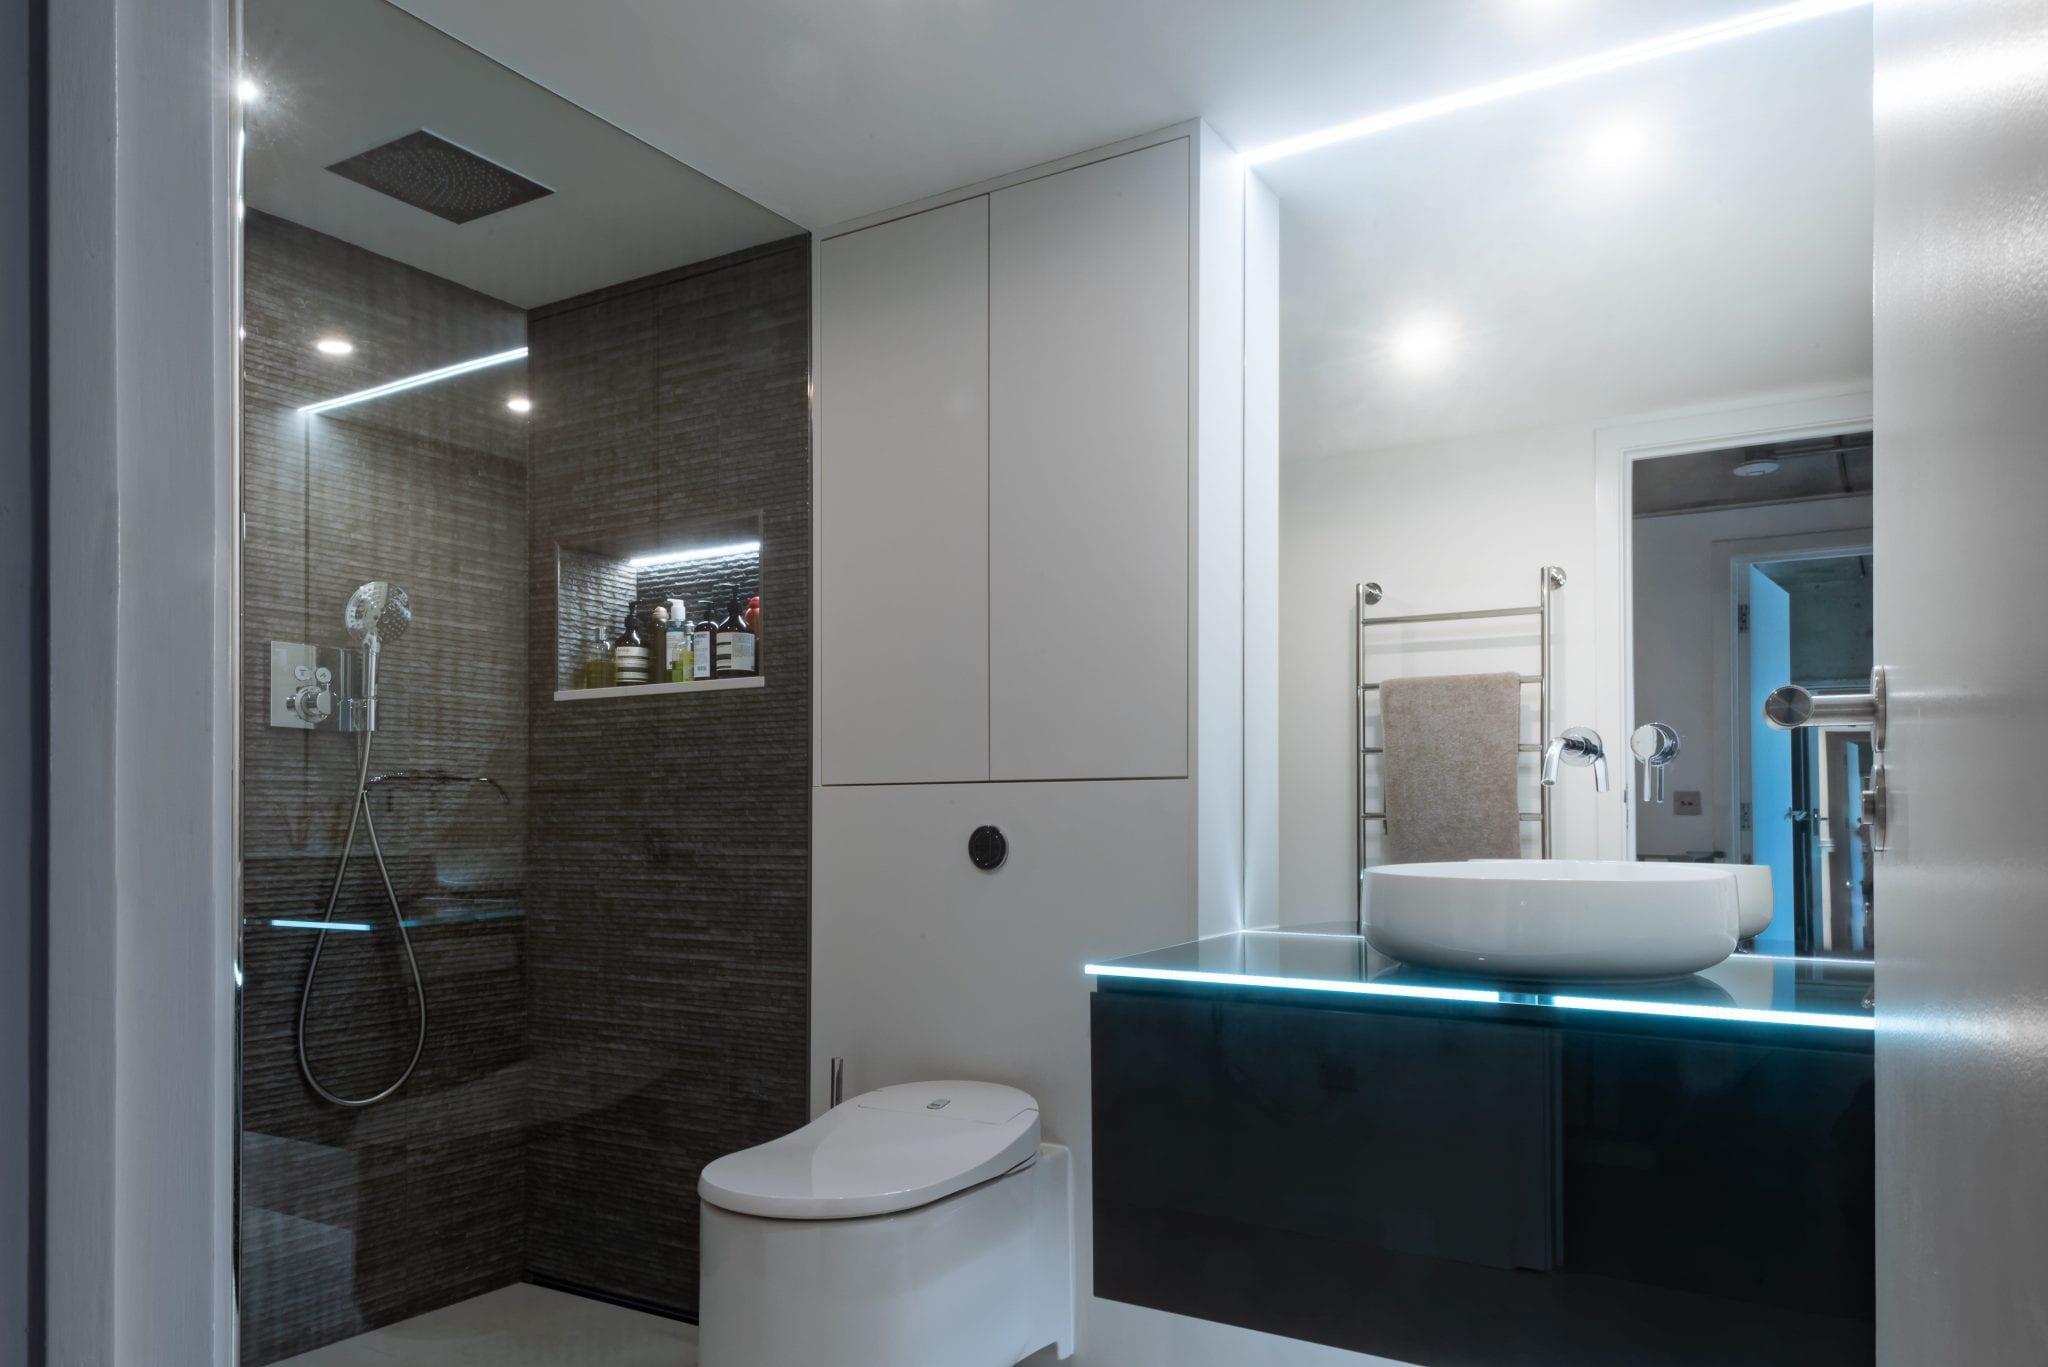 Bathroom fitters London